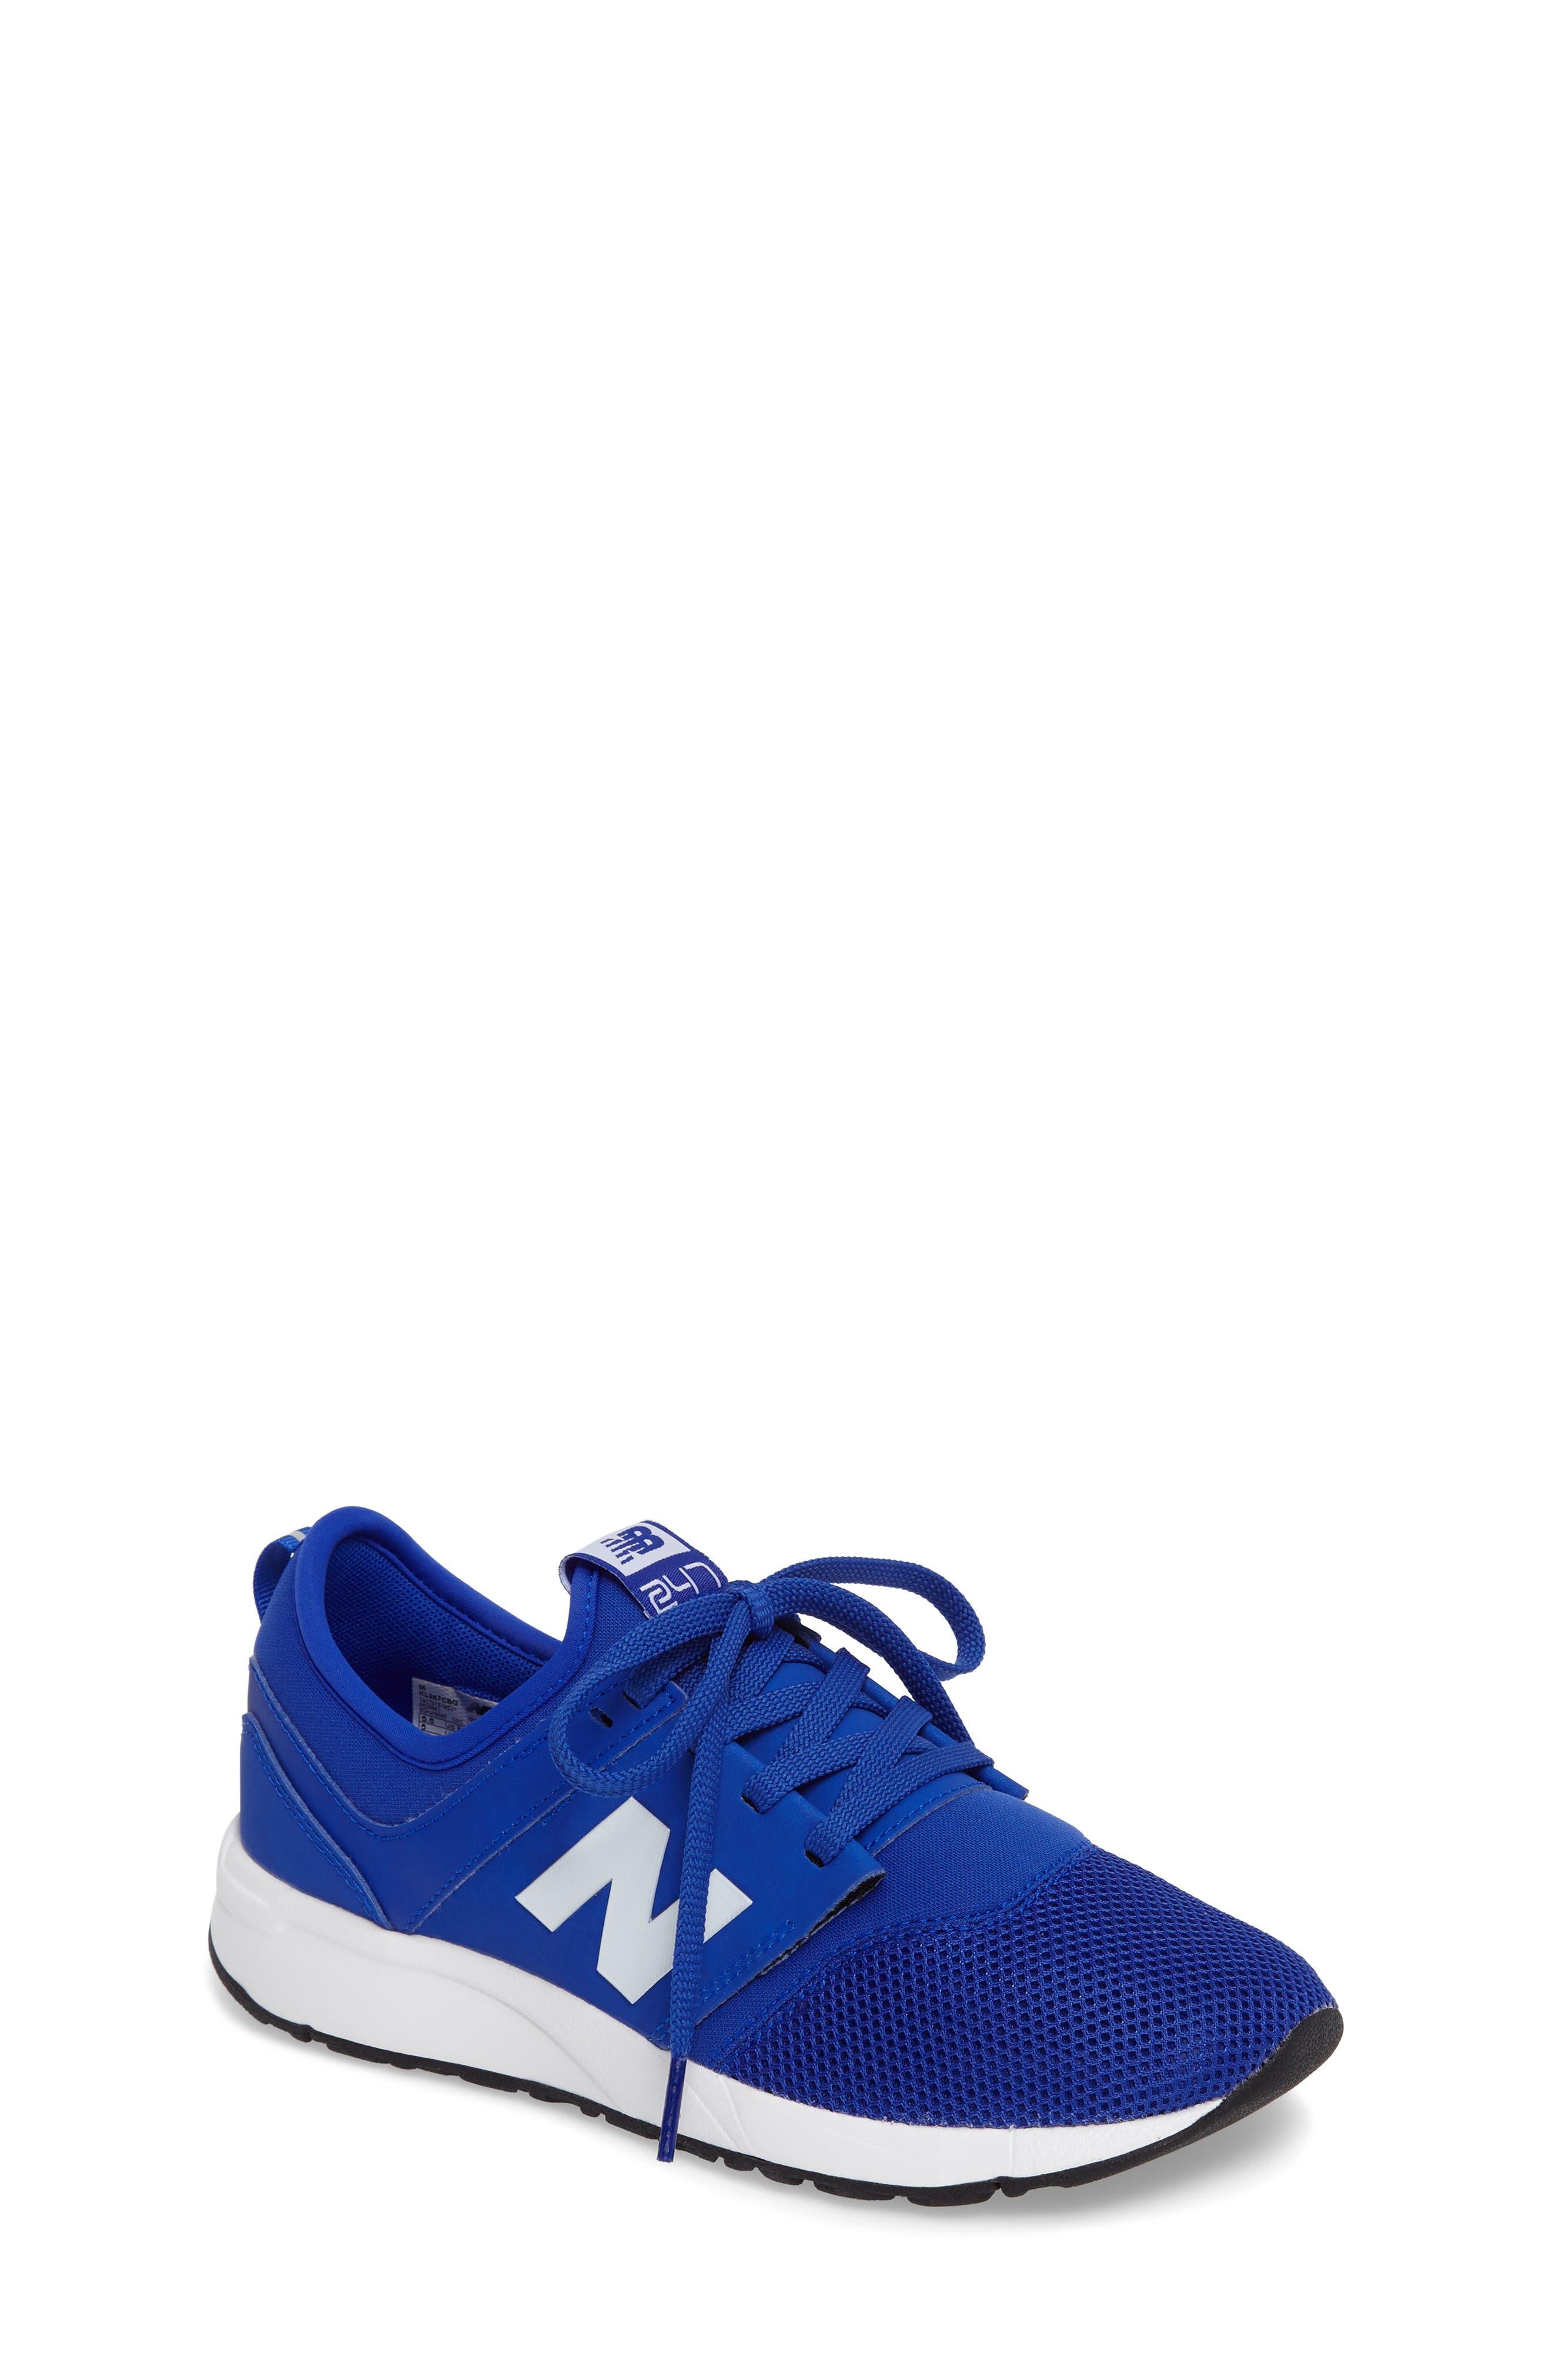 NEW BALANCE 247 Core Sneaker